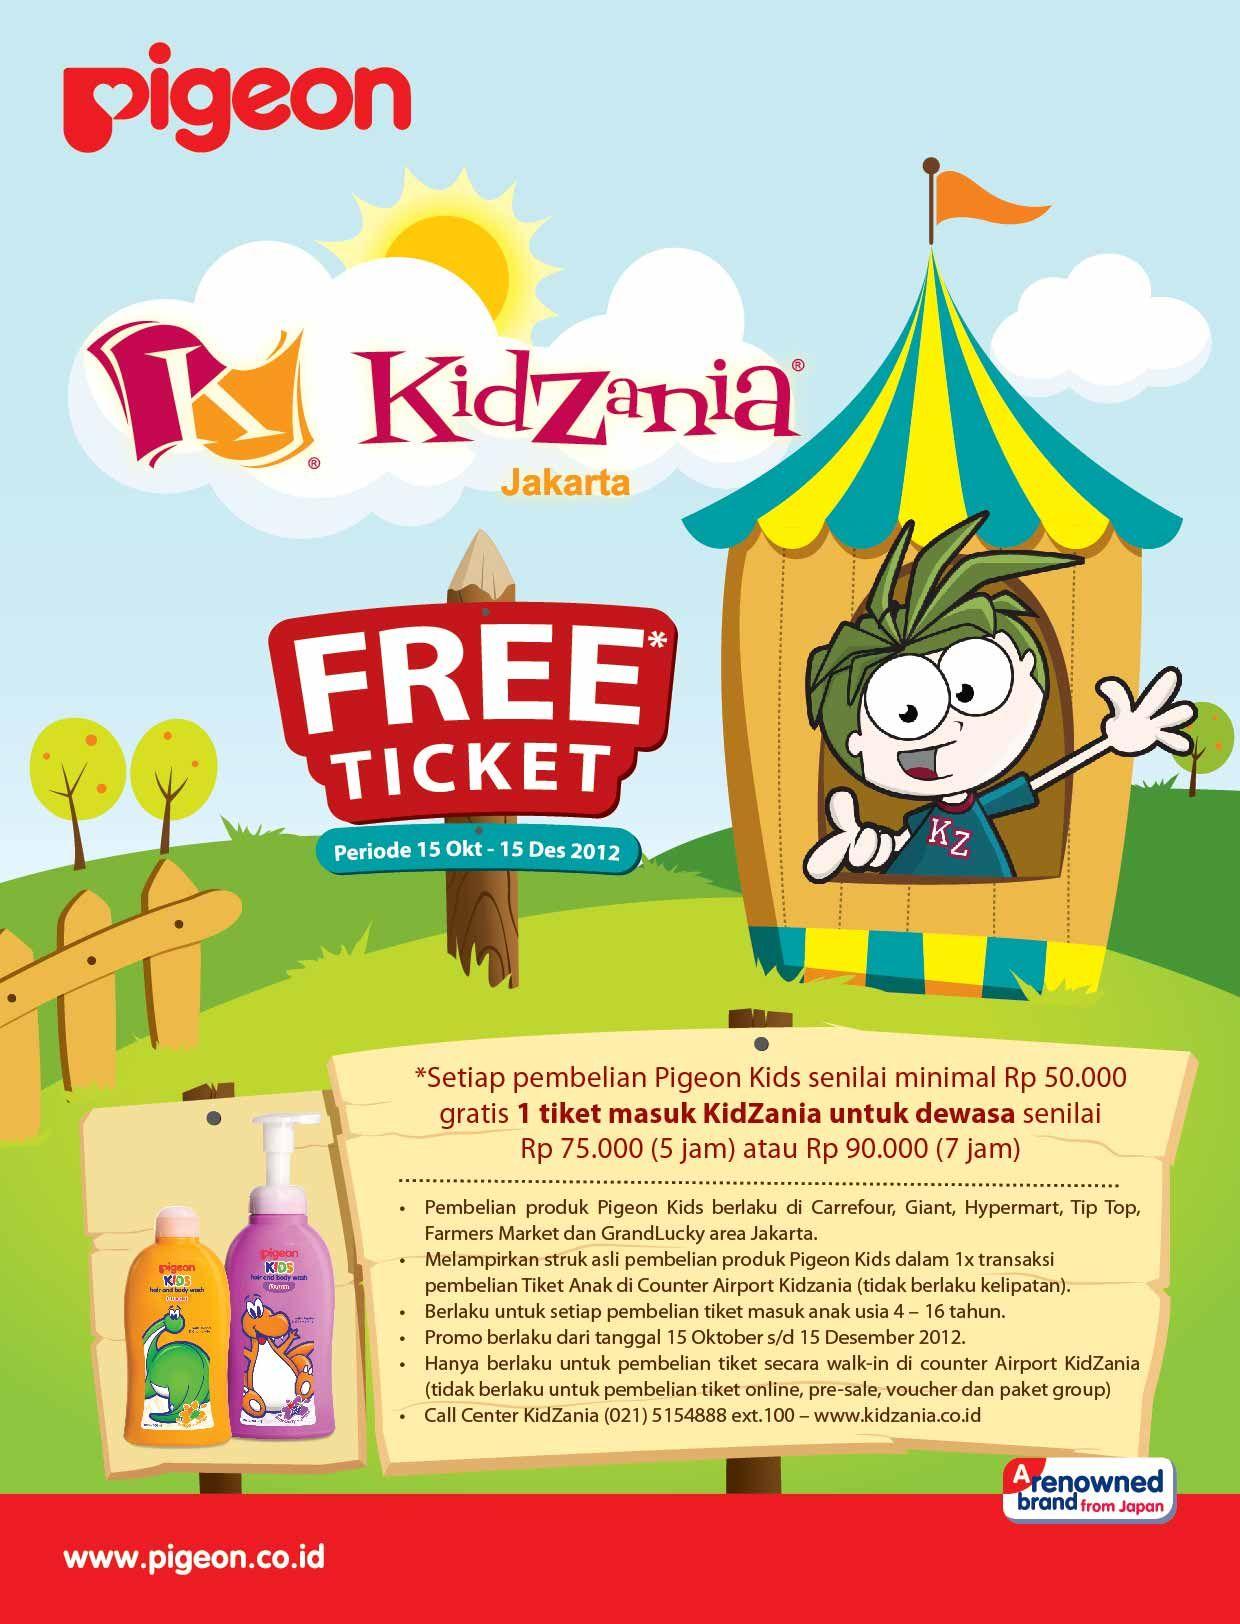 Joint Promo Kidzania Pigeon Info Detailnya Di Www Kidzania Co Id Atau M Kidzania Co Id Kids Design Comics Kids